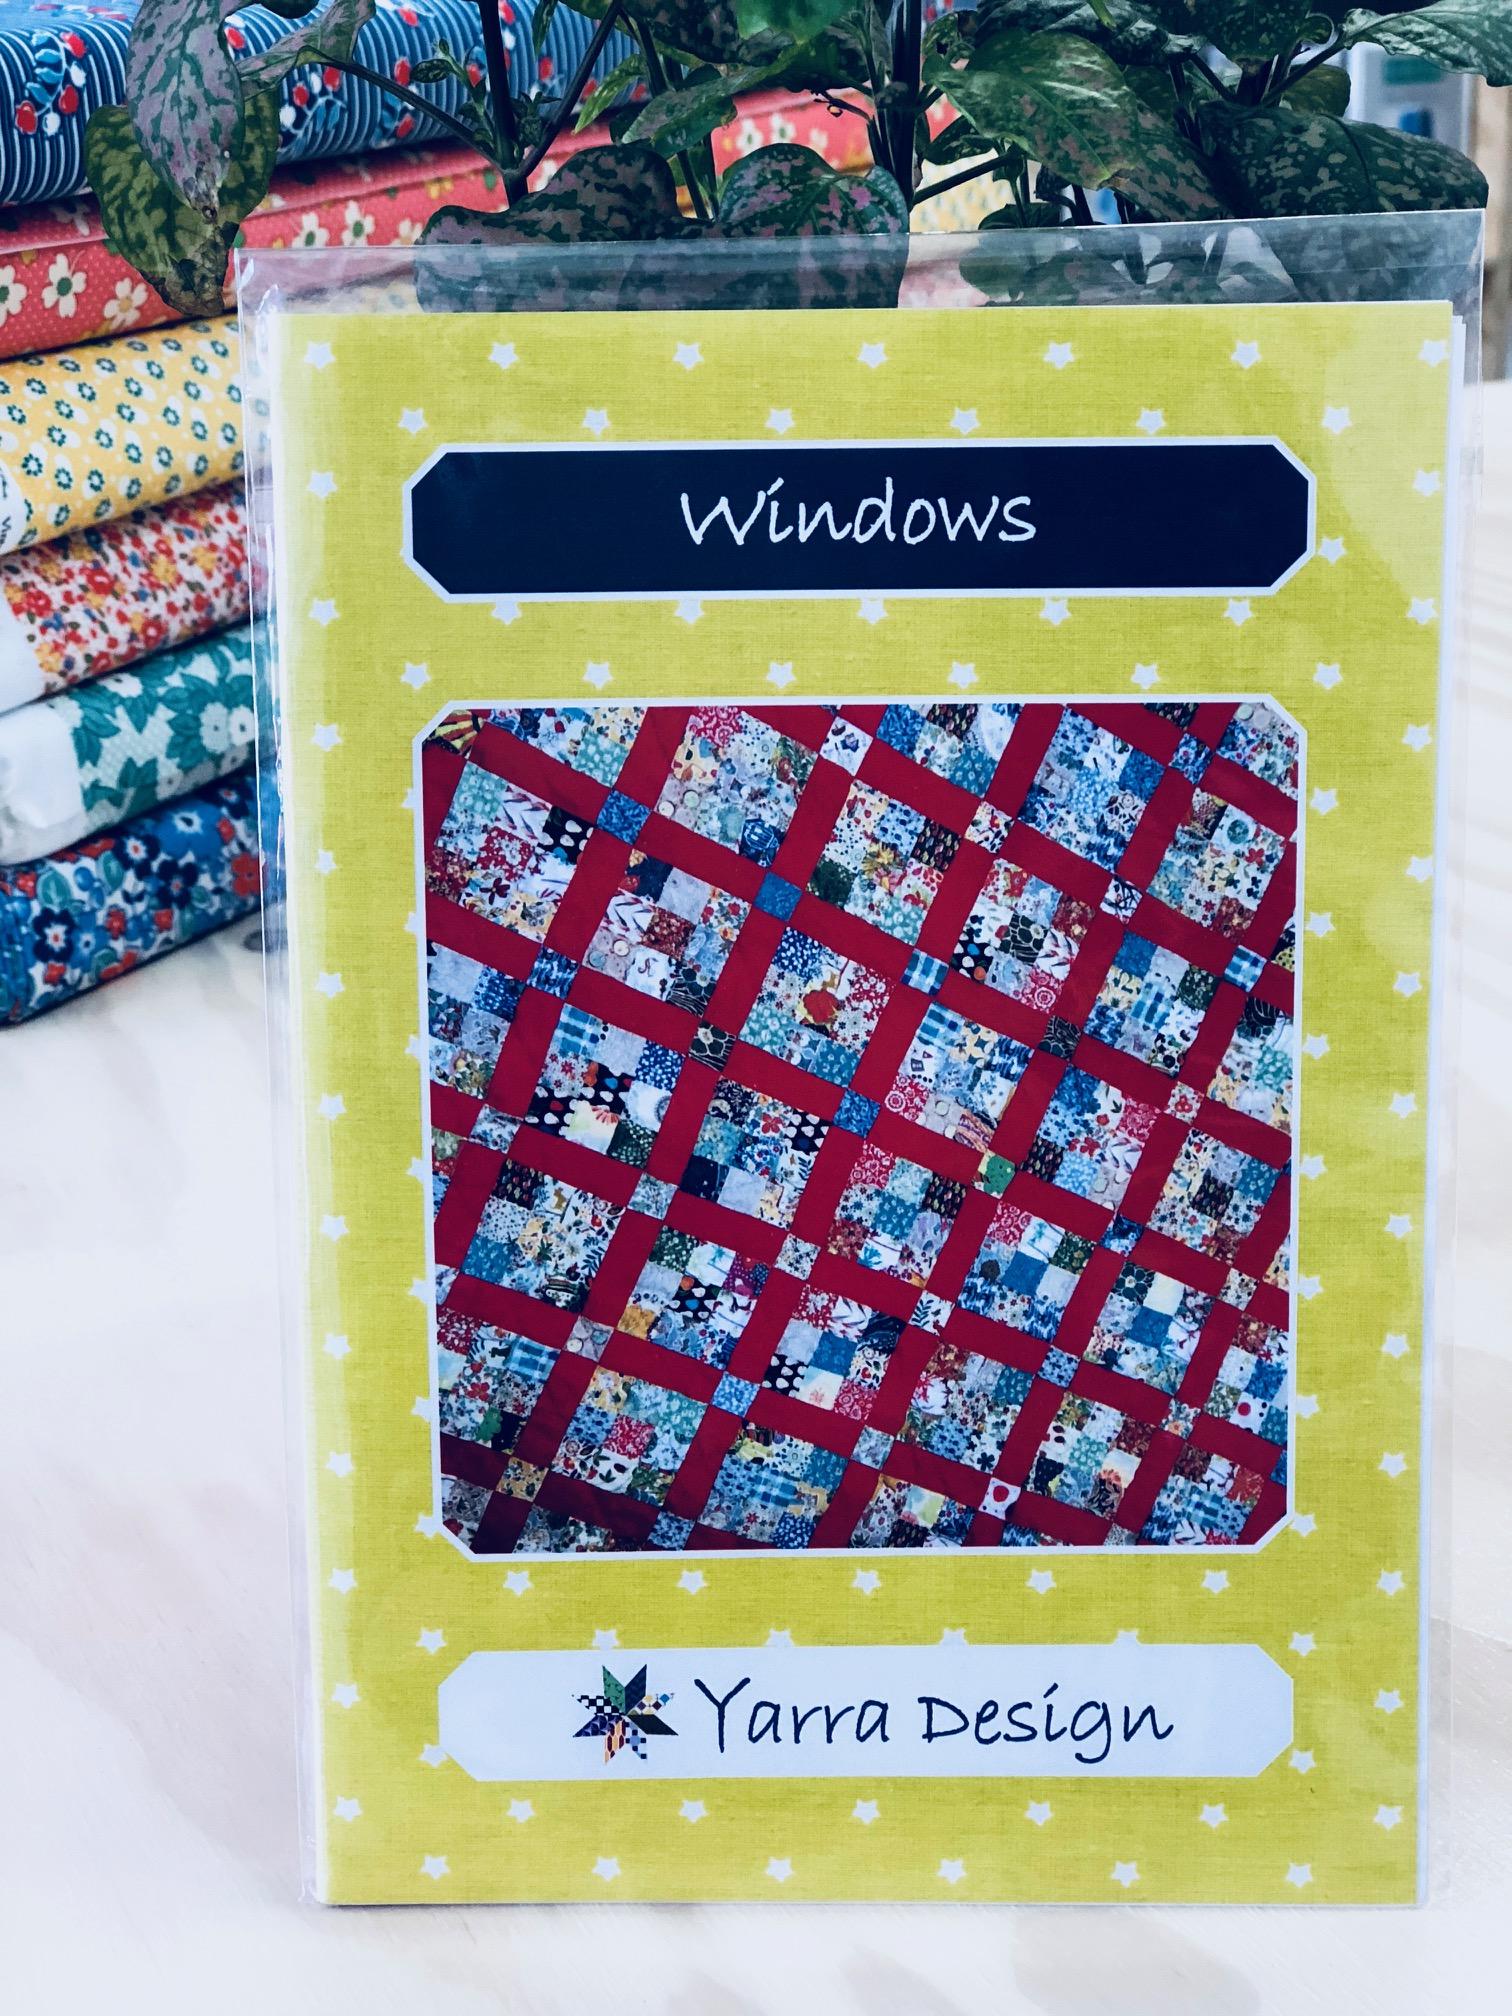 Yarra Design - Window